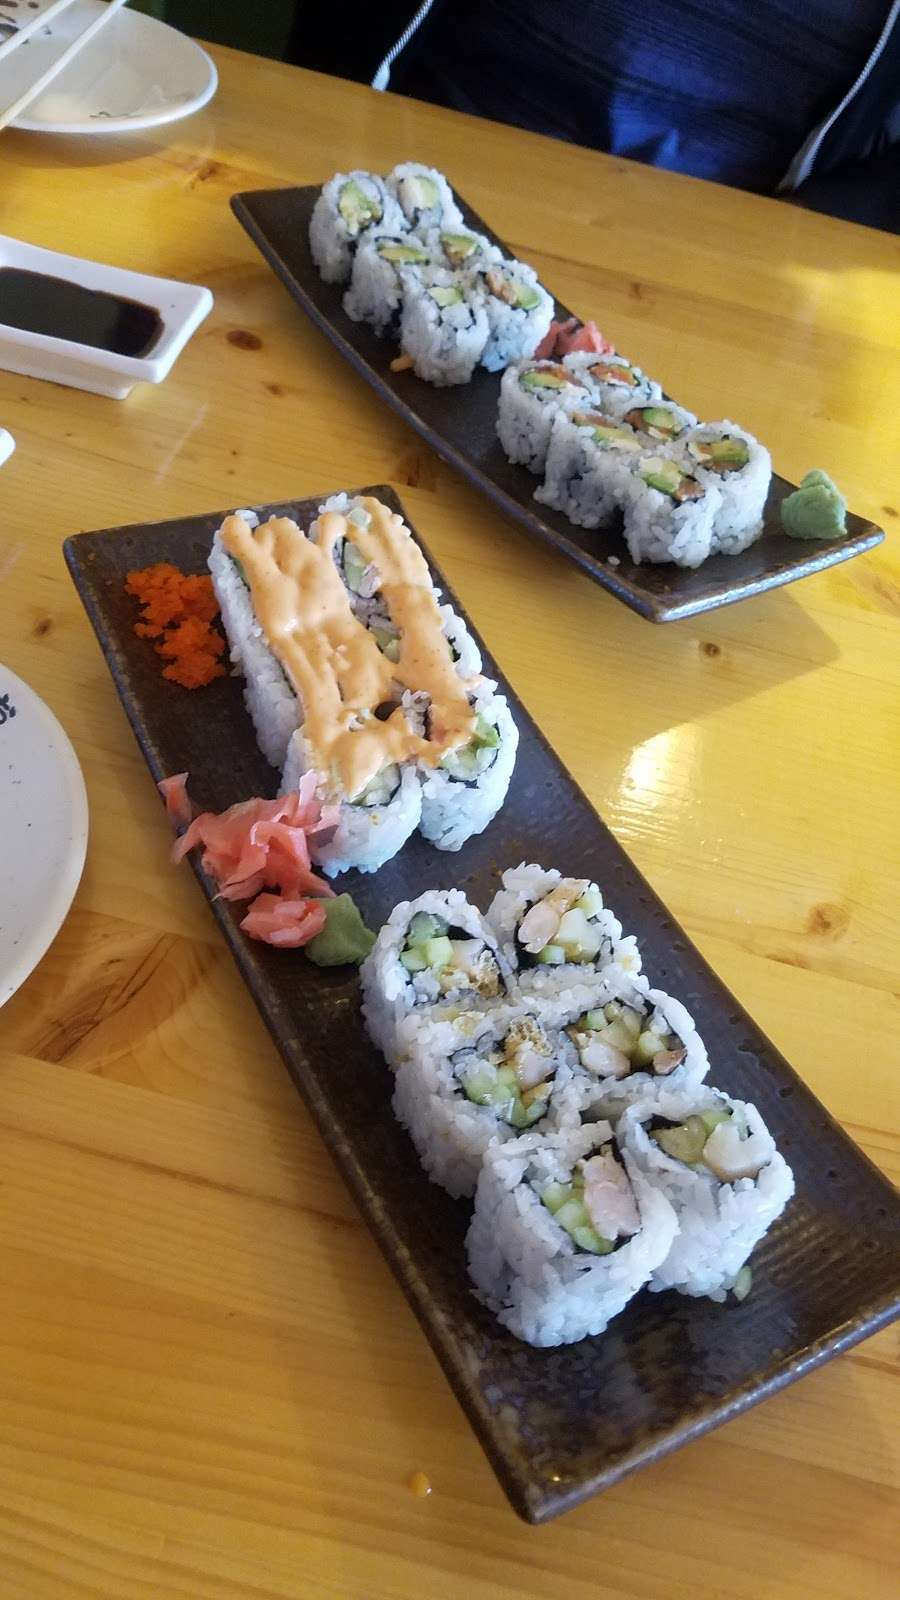 Little Tokyo - restaurant  | Photo 7 of 10 | Address: 425 Upton Dr, St Joseph, MI 49085, USA | Phone: (269) 982-0806